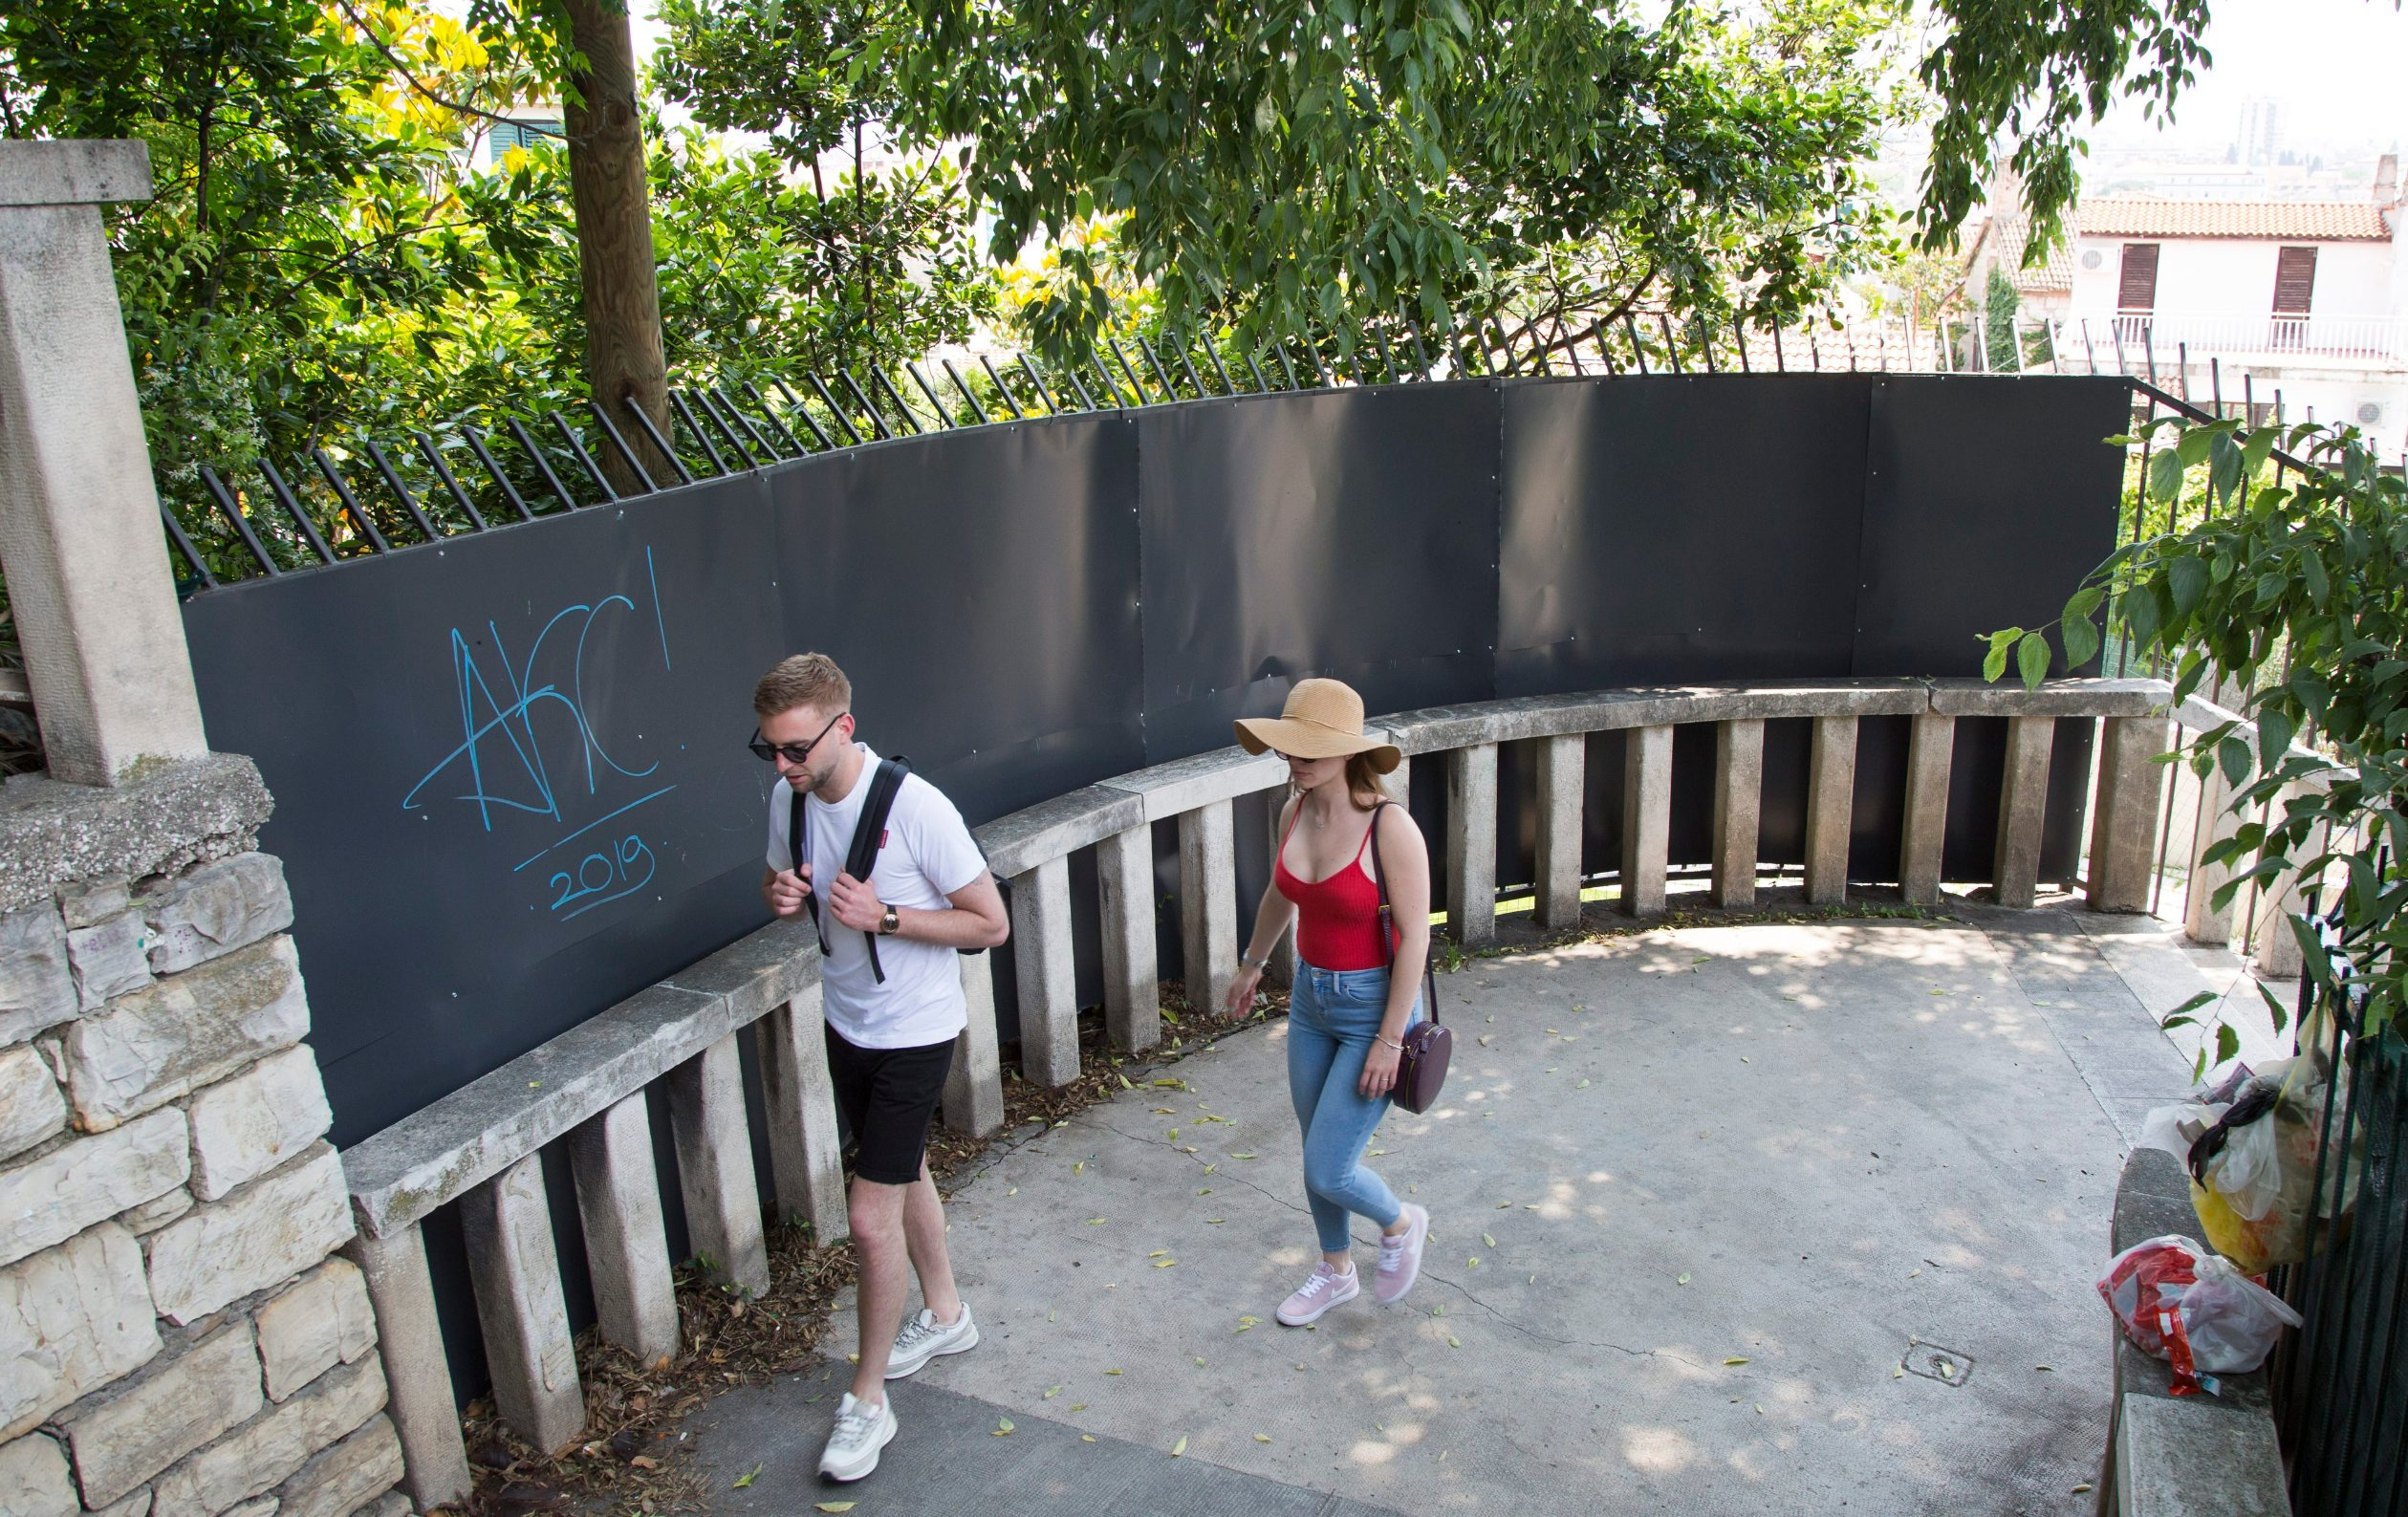 Split, 050619.  Marjanske skale. Kuca Vucevic u Varosu. Vlasnik je podigao metalnu ogradu povise ograde setalista. Foto: Vojko Basic / CROPIX